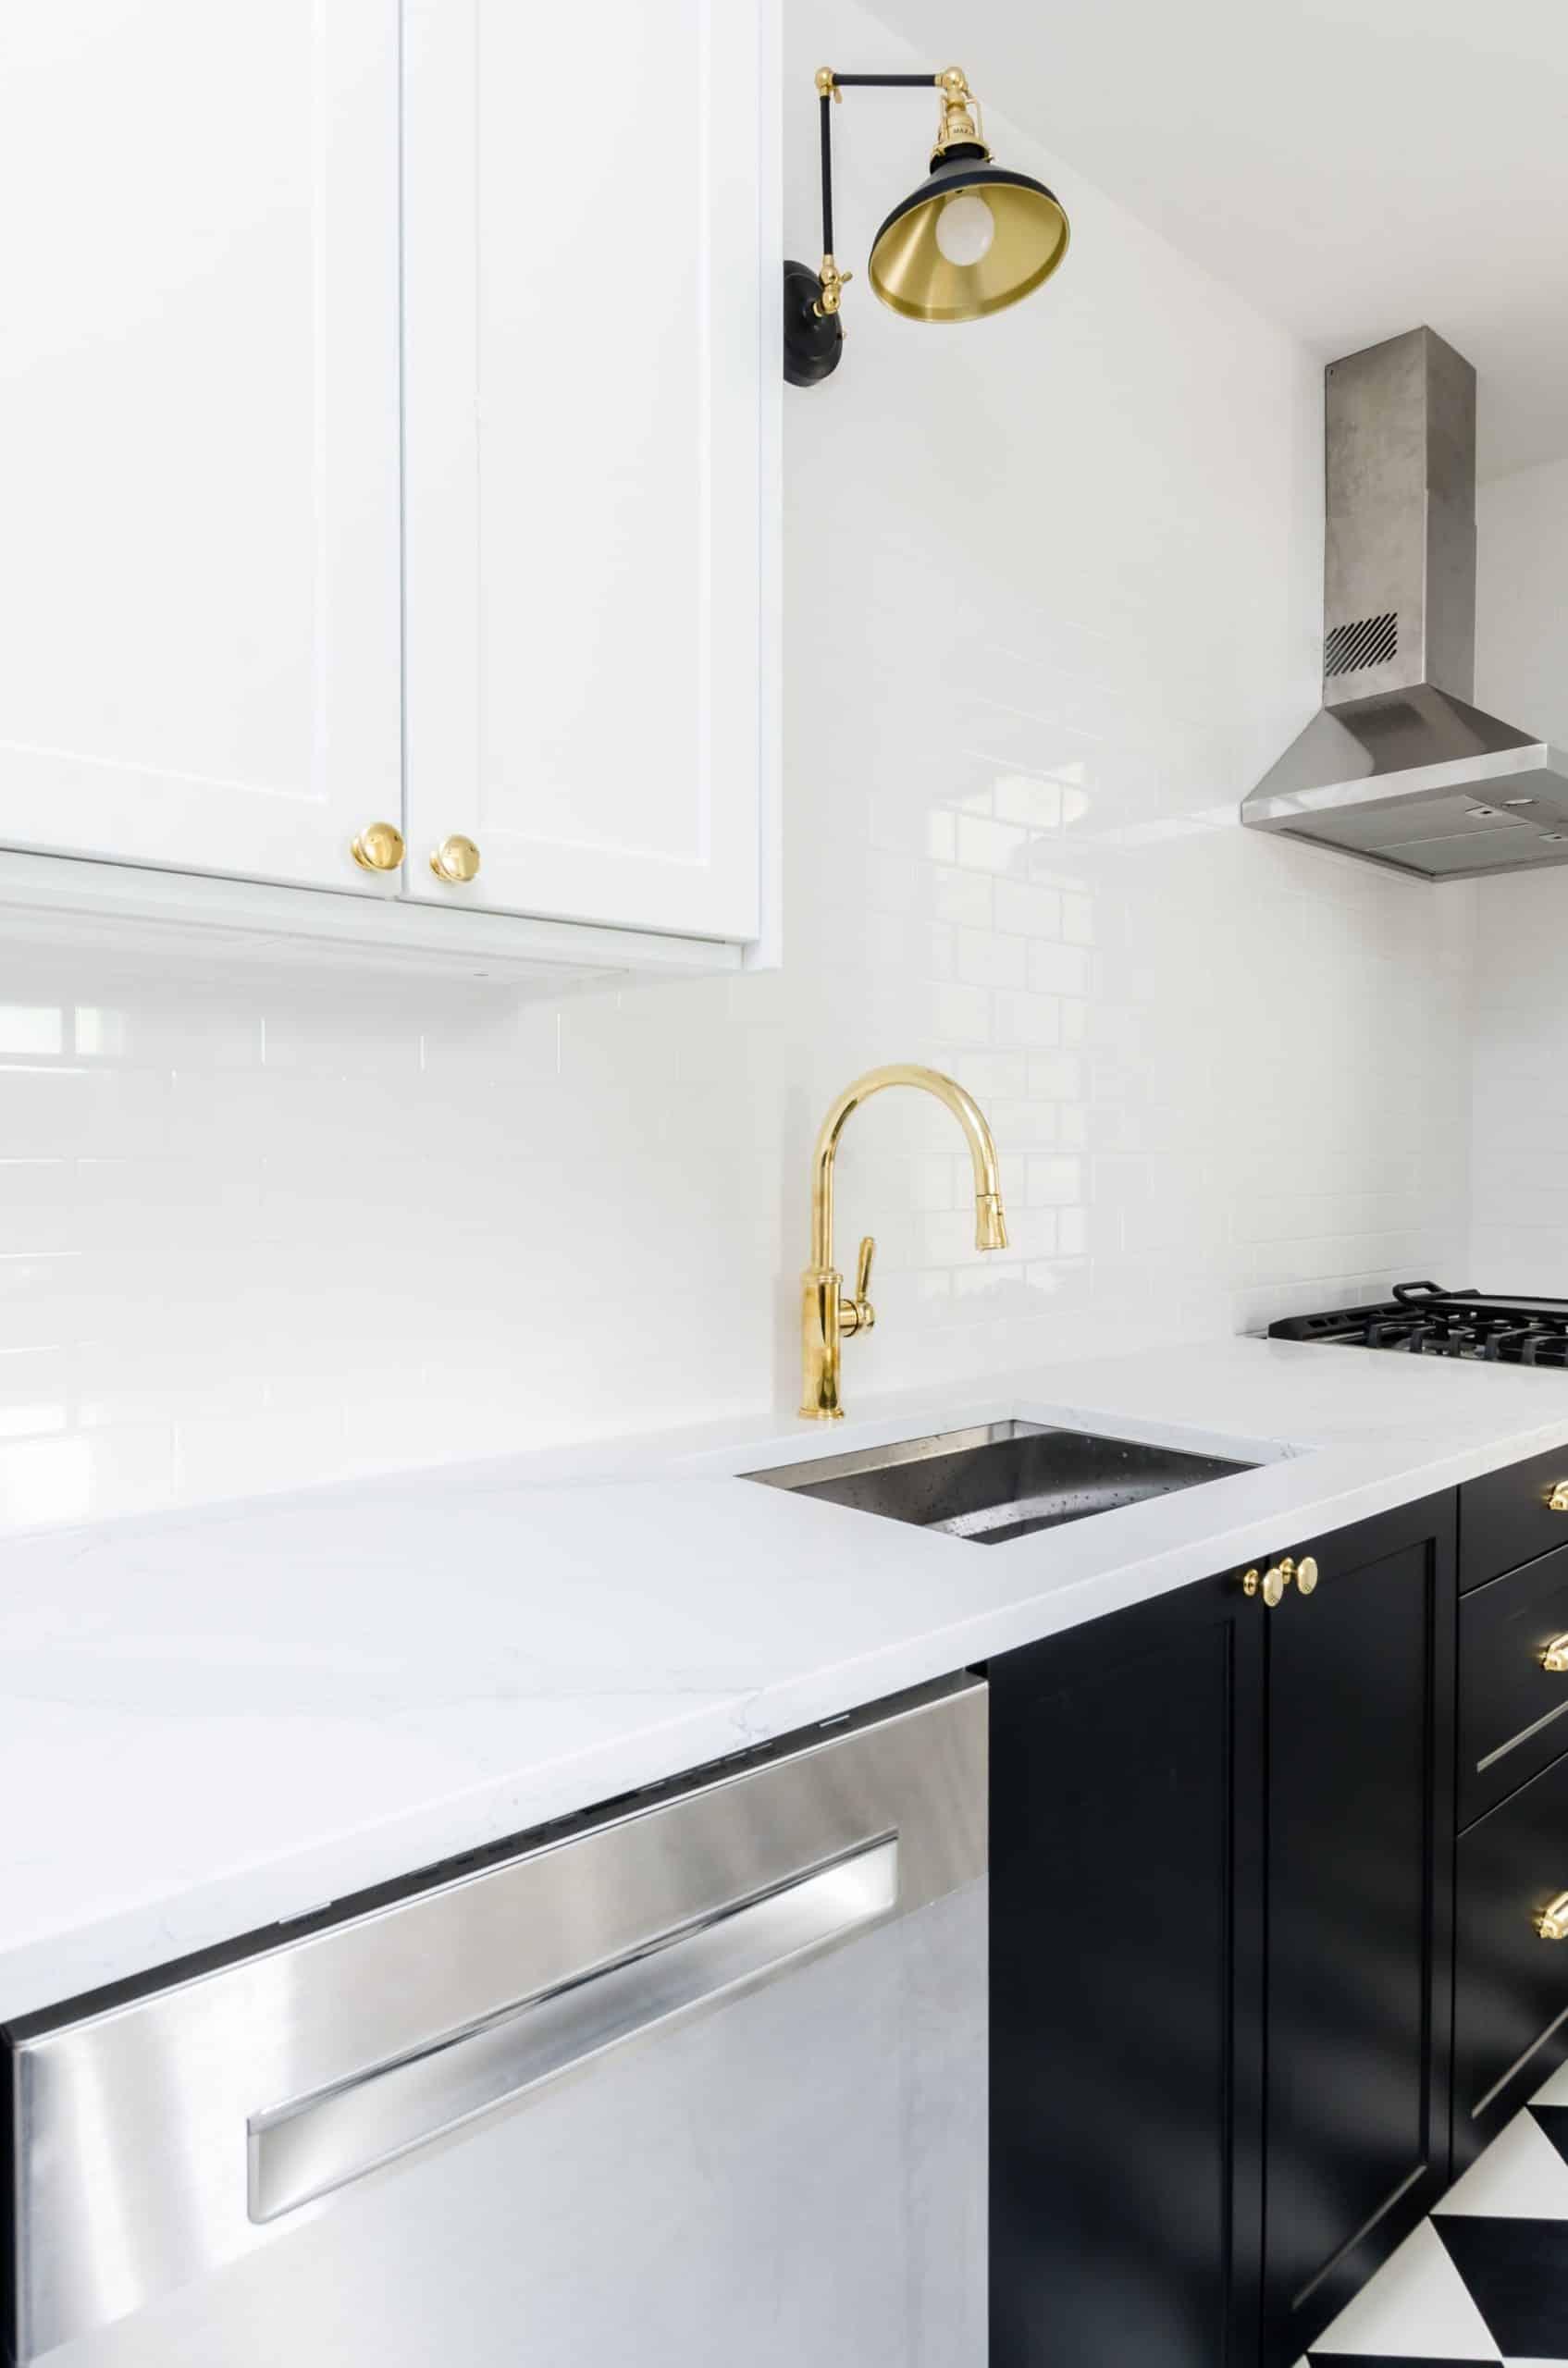 Save Money New Appliances Article Image